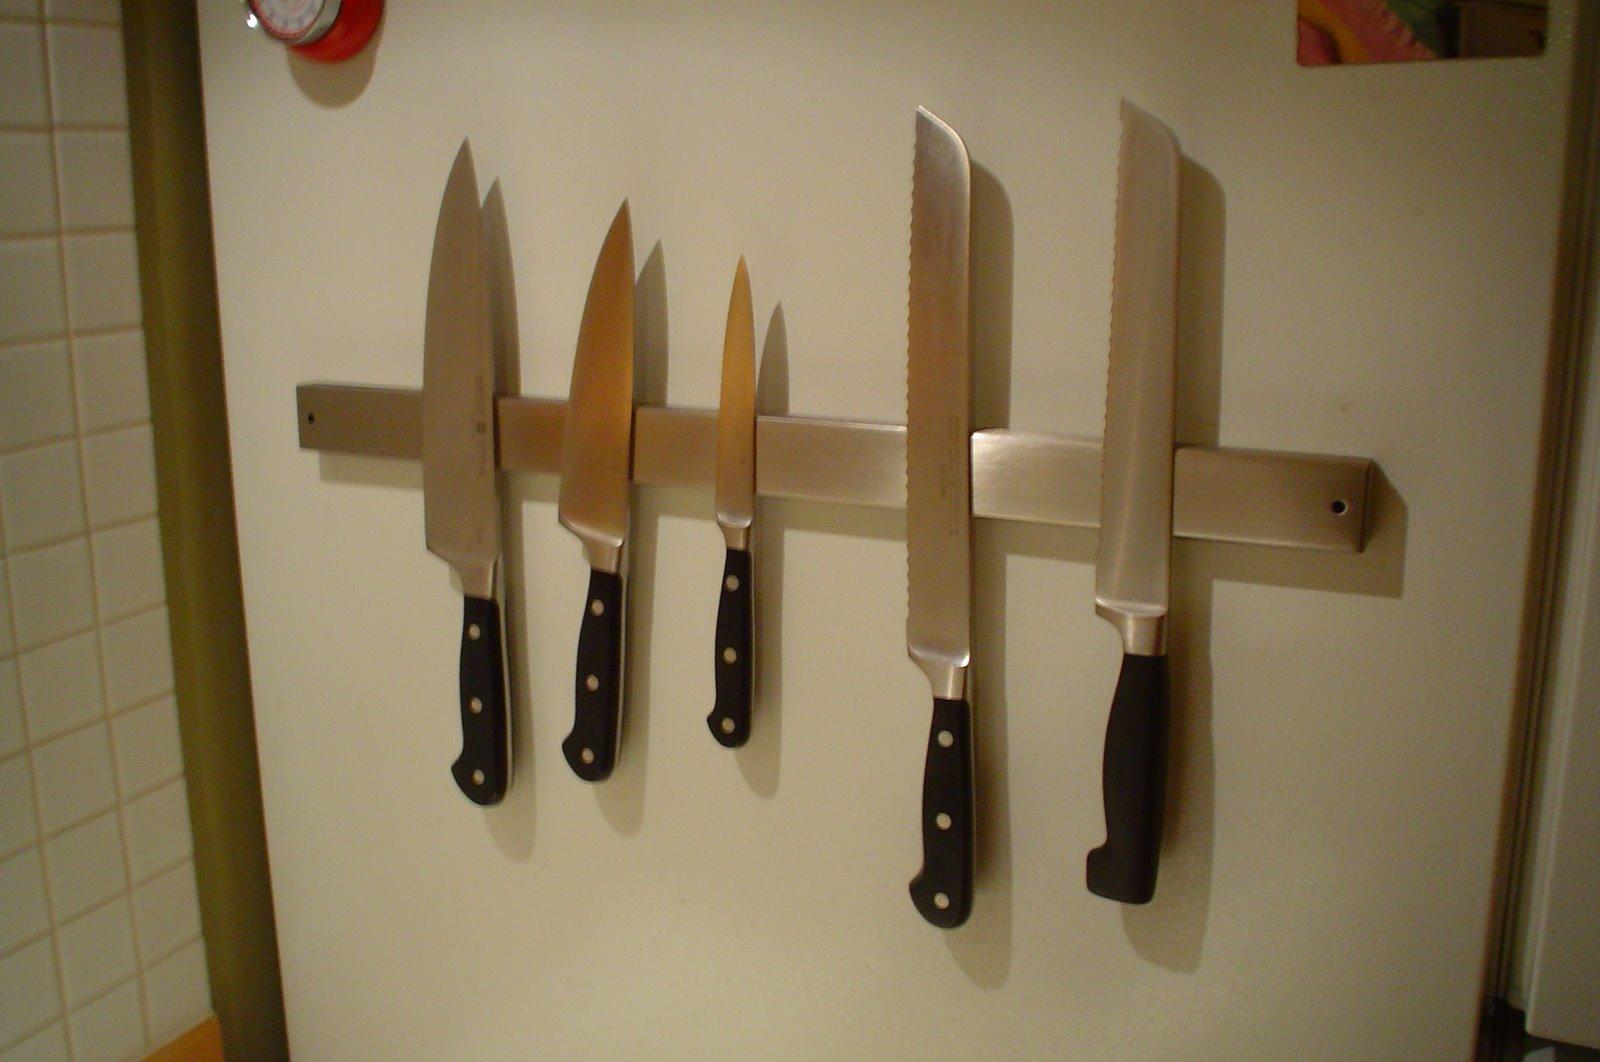 magnetic kitchen knife holder design bangalore hacks ikea hackers